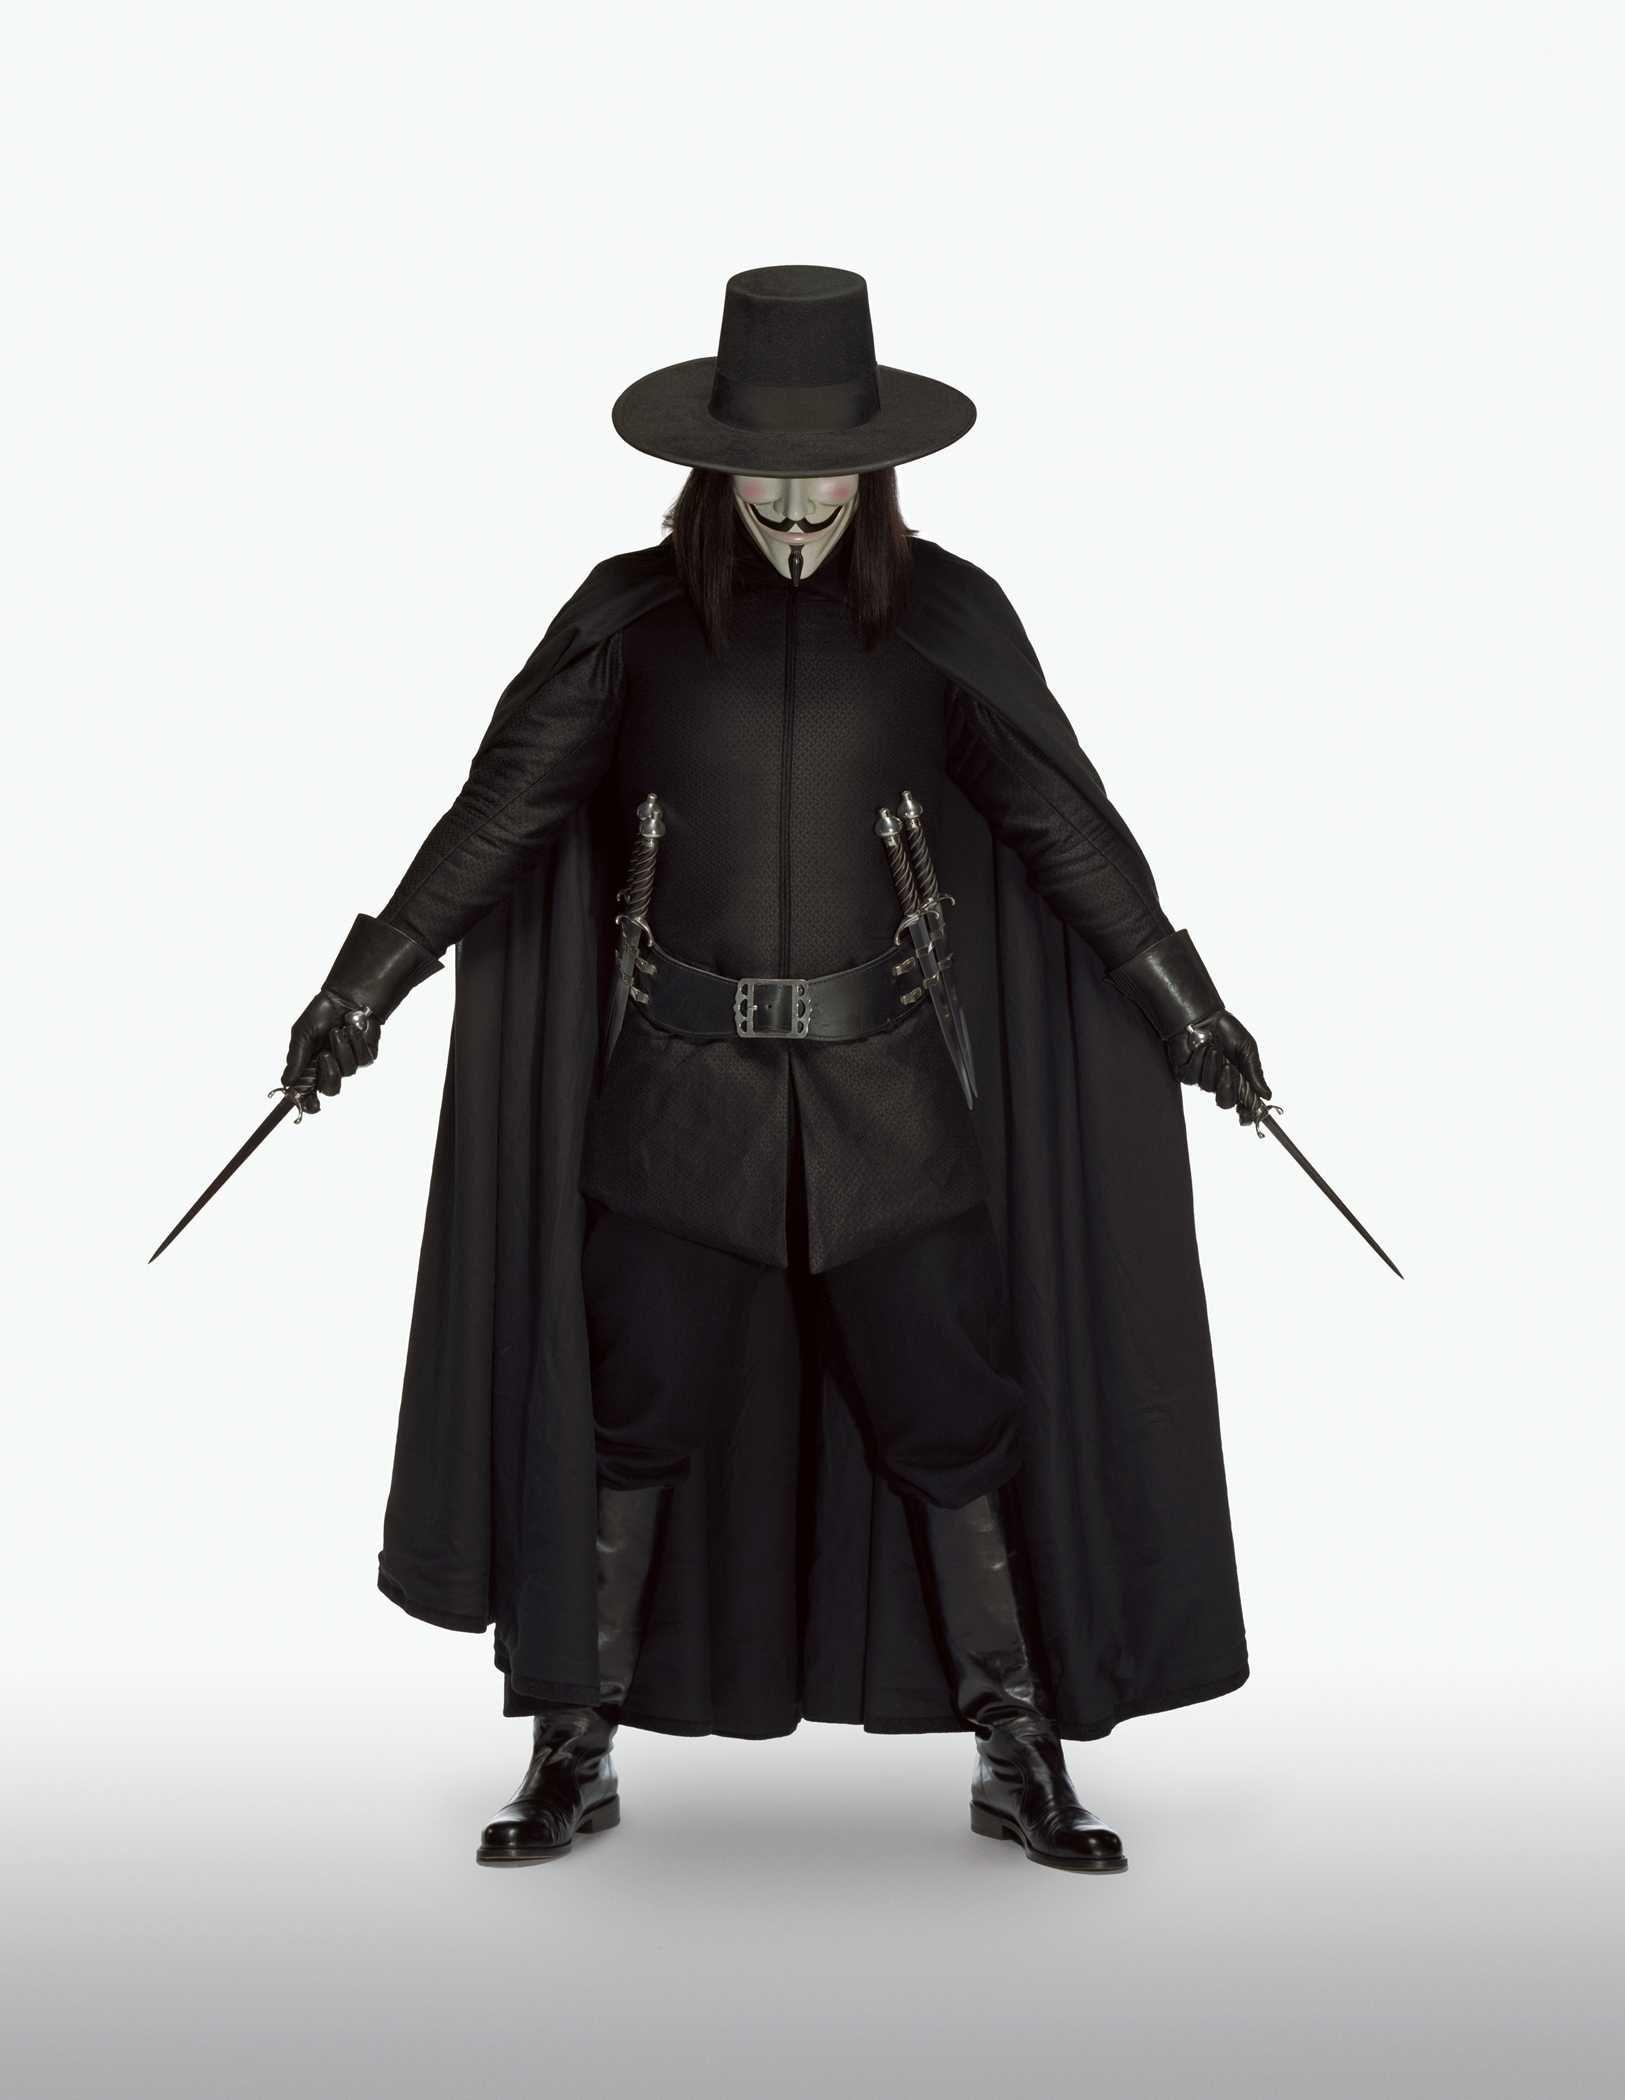 V For Vendetta Photo V For Vendetta V For Vendetta V For Vendetta Costume Guy Fawkes